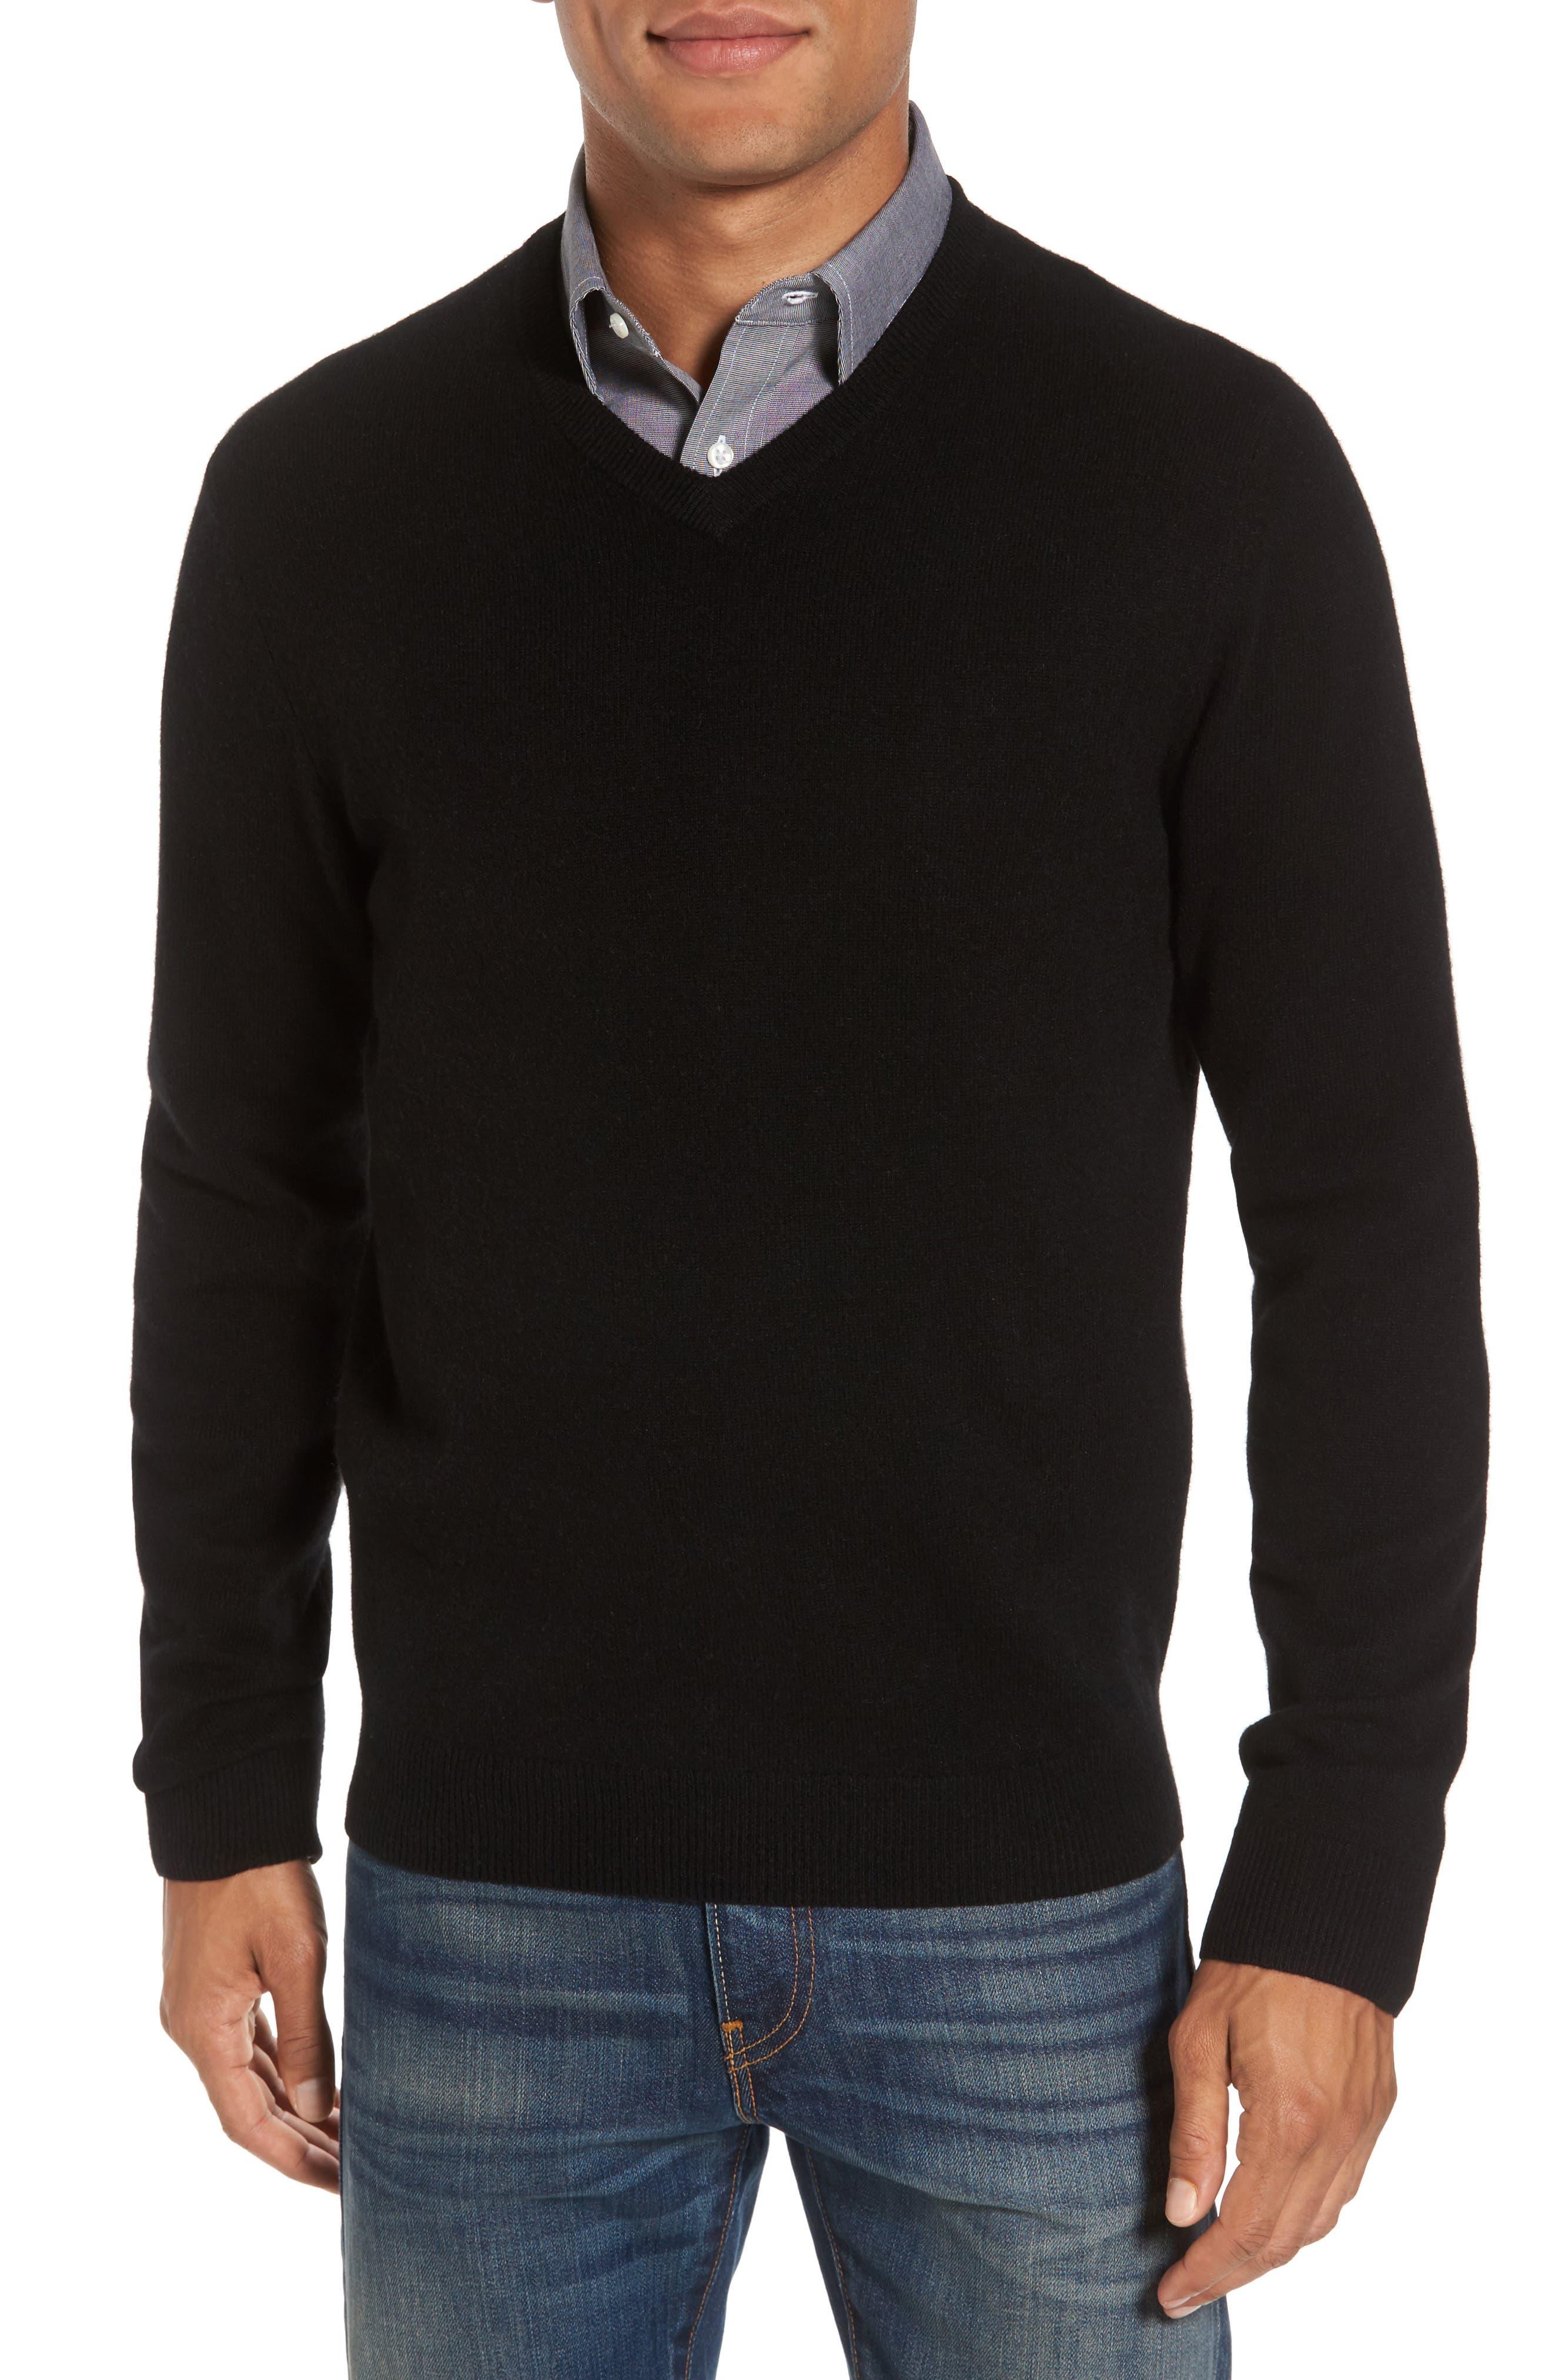 NORDSTROM MEN'S SHOP,                             Cashmere V-Neck Sweater,                             Main thumbnail 1, color,                             BLACK CAVIAR